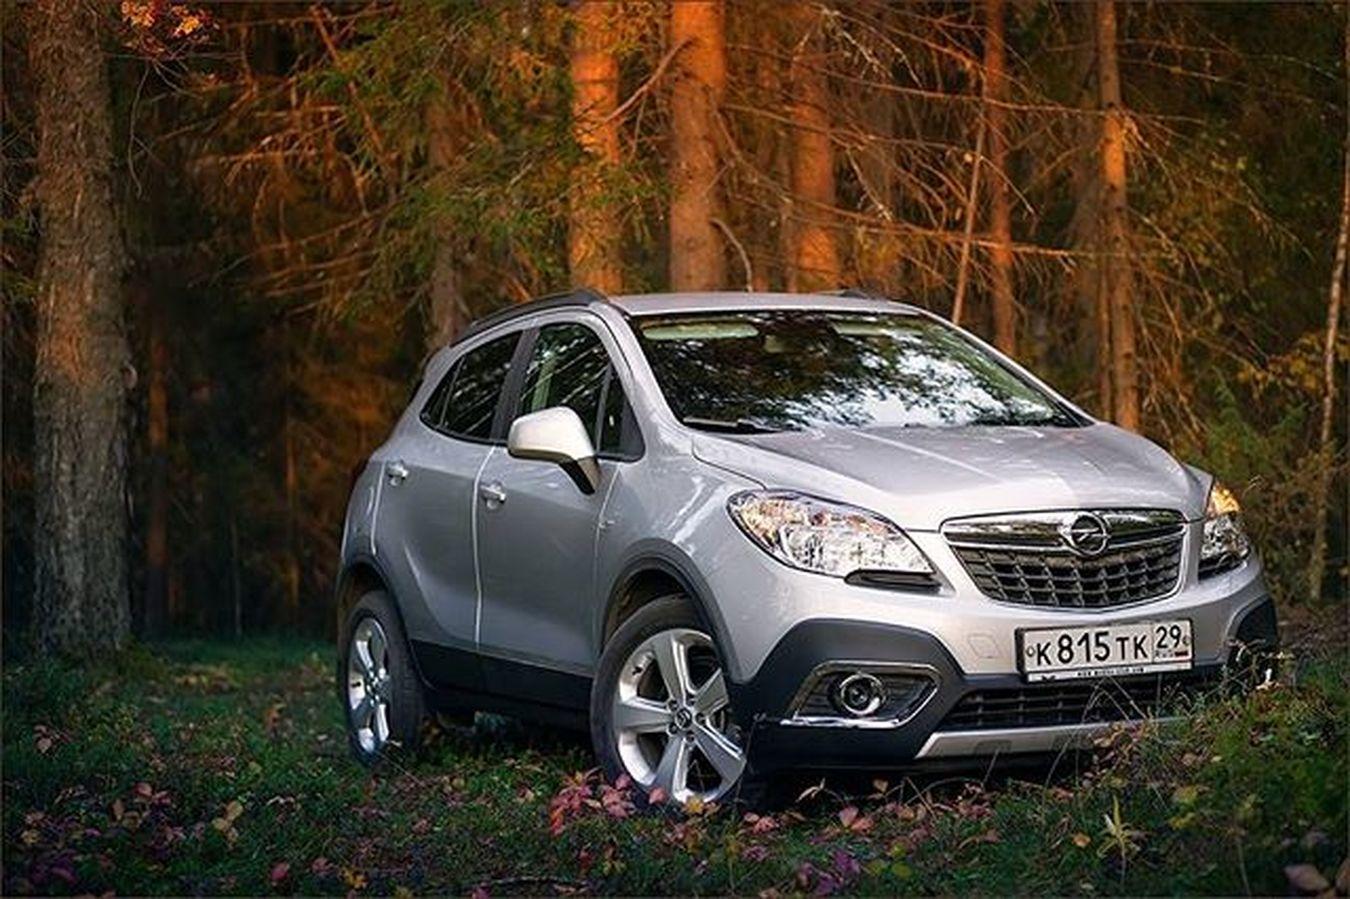 Car Cars Opel Opelmokkax Mokka Autop Autos опель опельмокка моеавто моятачка тачка турбо Дорога Opelrussia